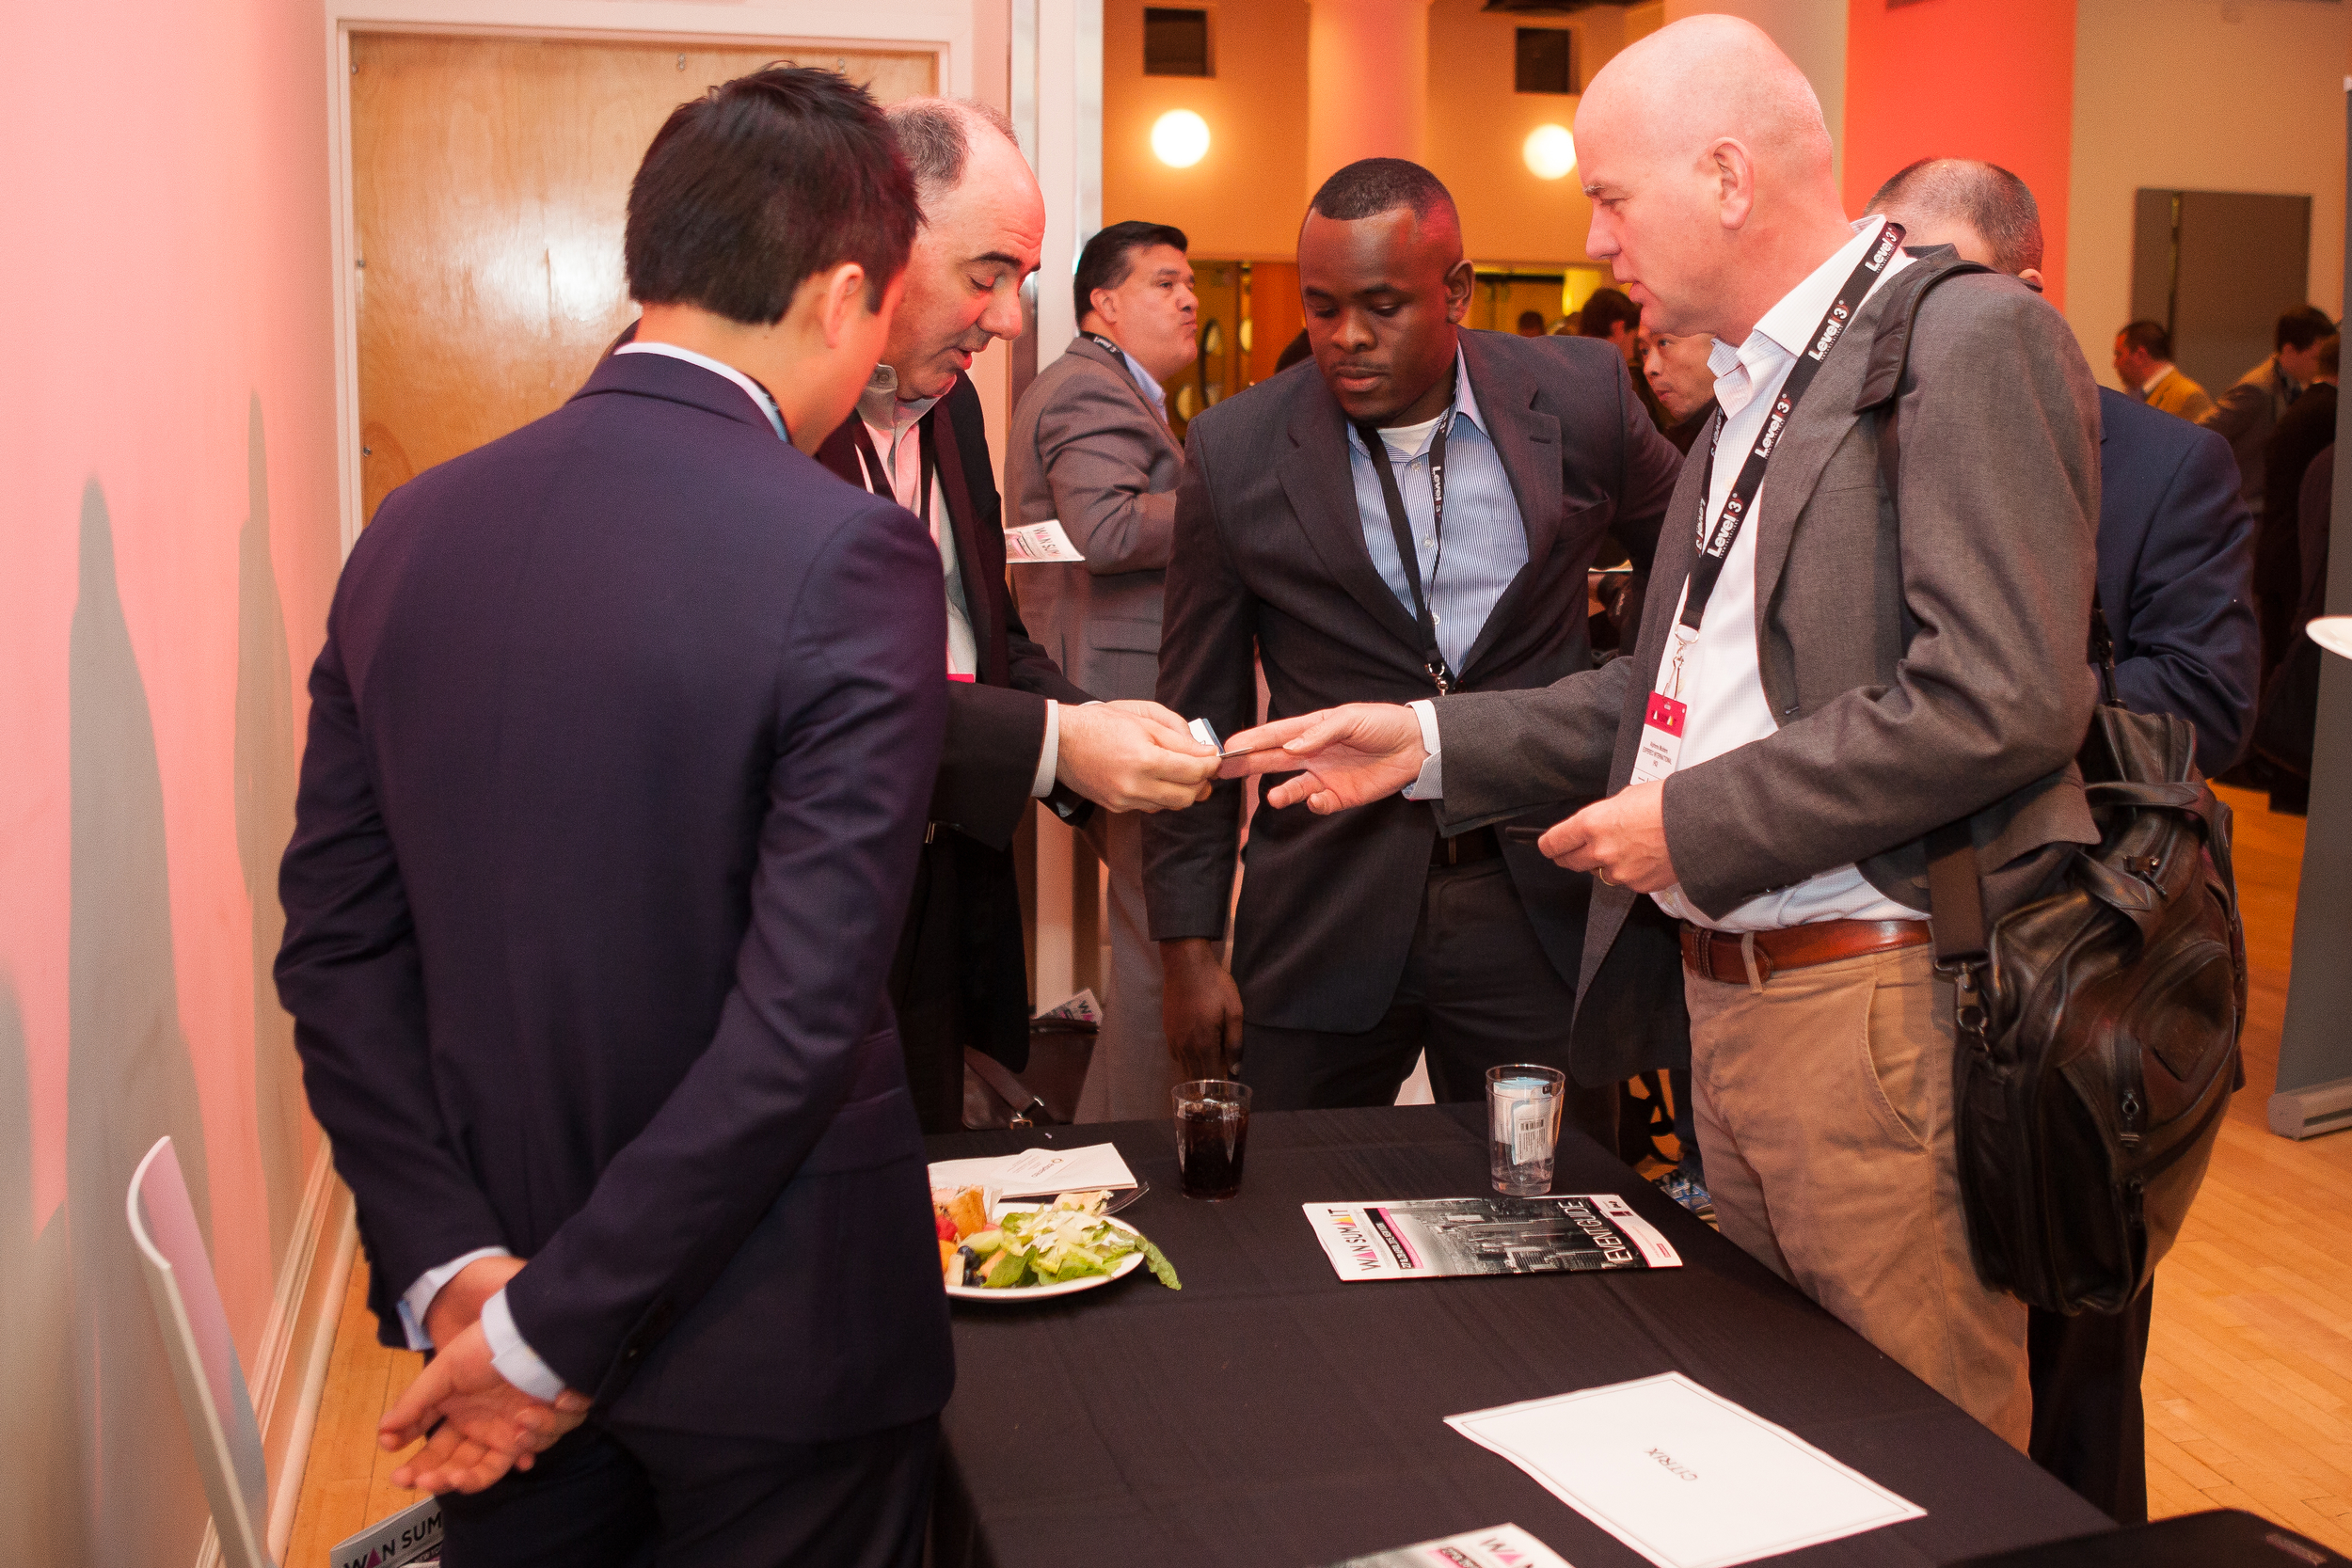 013-Capacity_Conferences-WAN_Summit-042715-IMG_0388.jpg